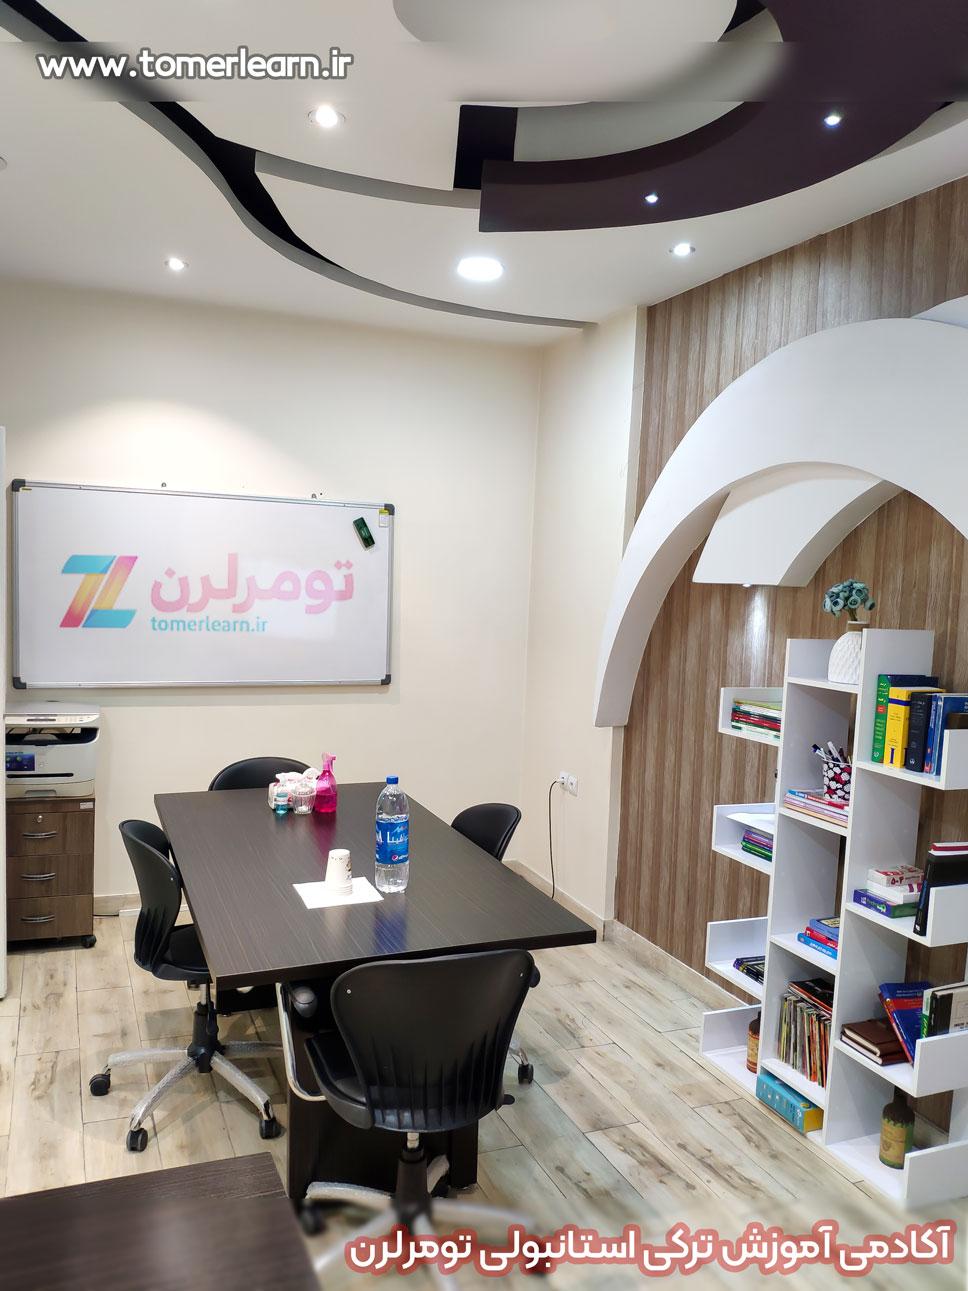 IMG 20210521 155147 - آموزش زبان ترکی استانبولی در تبریز | تومرلرن